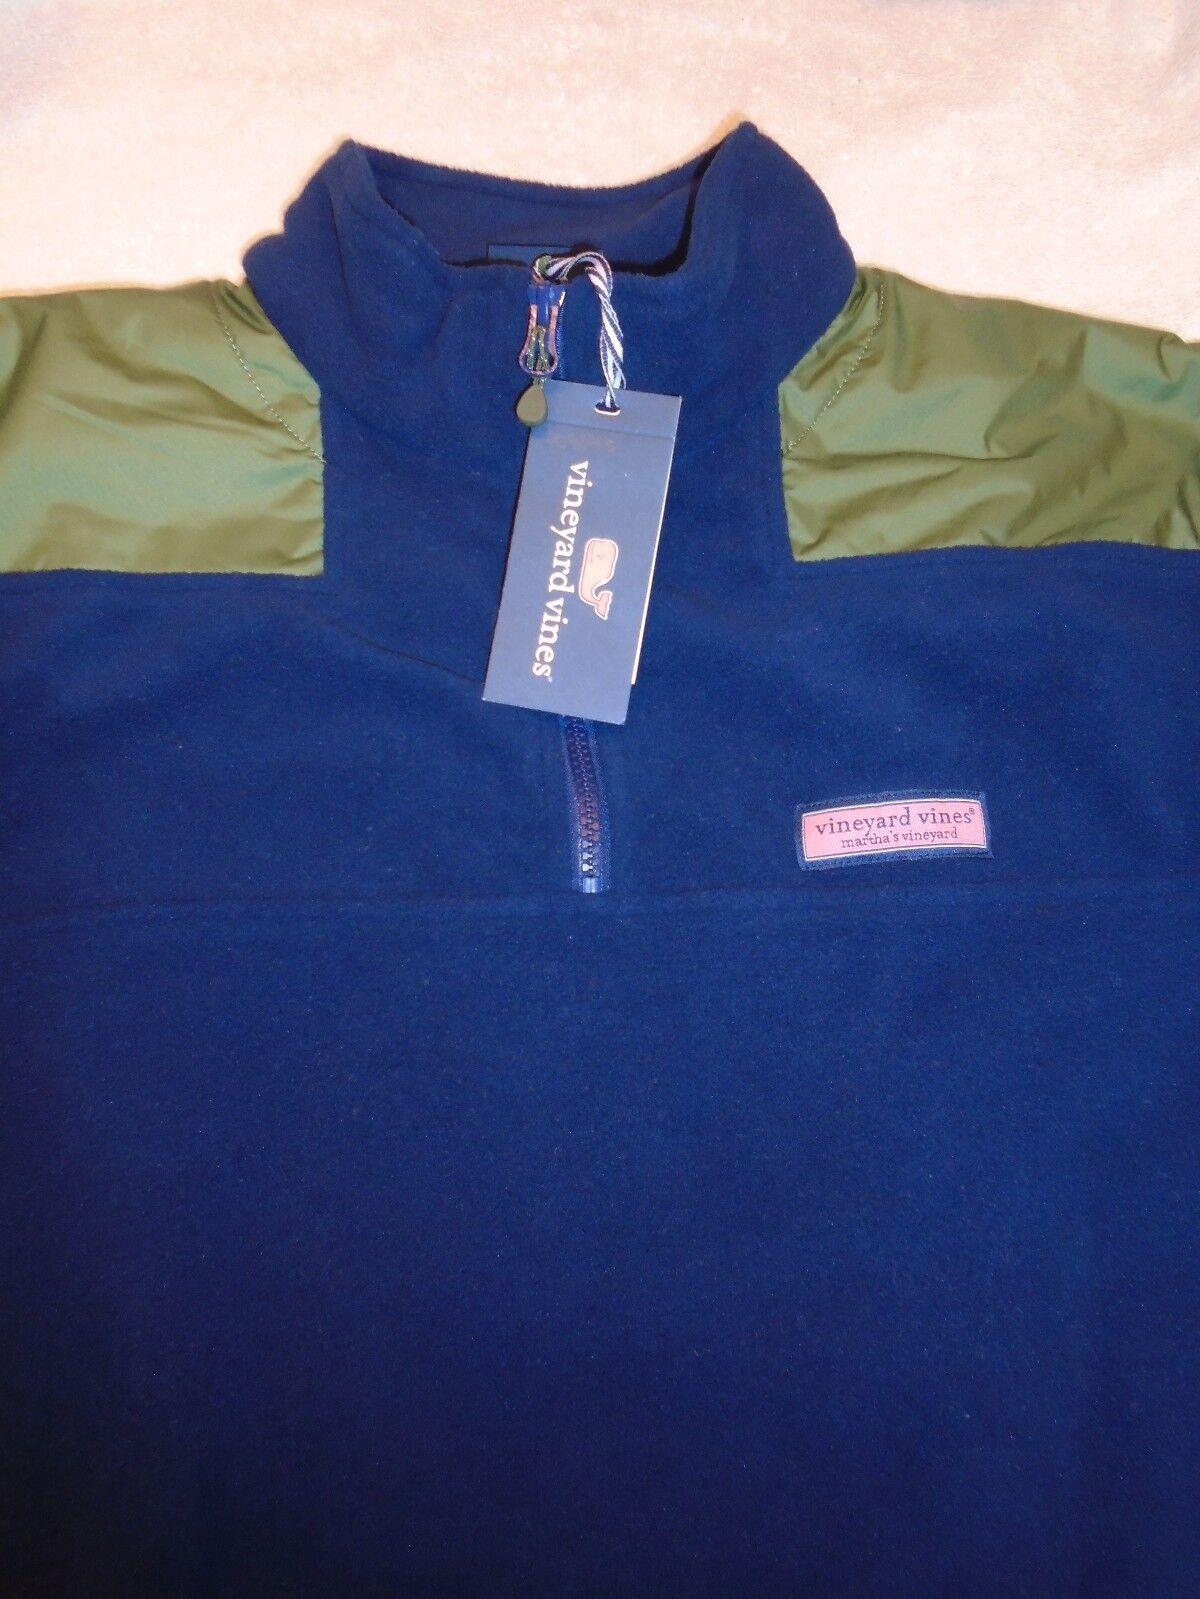 Vineyard vines Quarter Zip Shep Shirt Fleece with Nylon Shoulder NWT Small